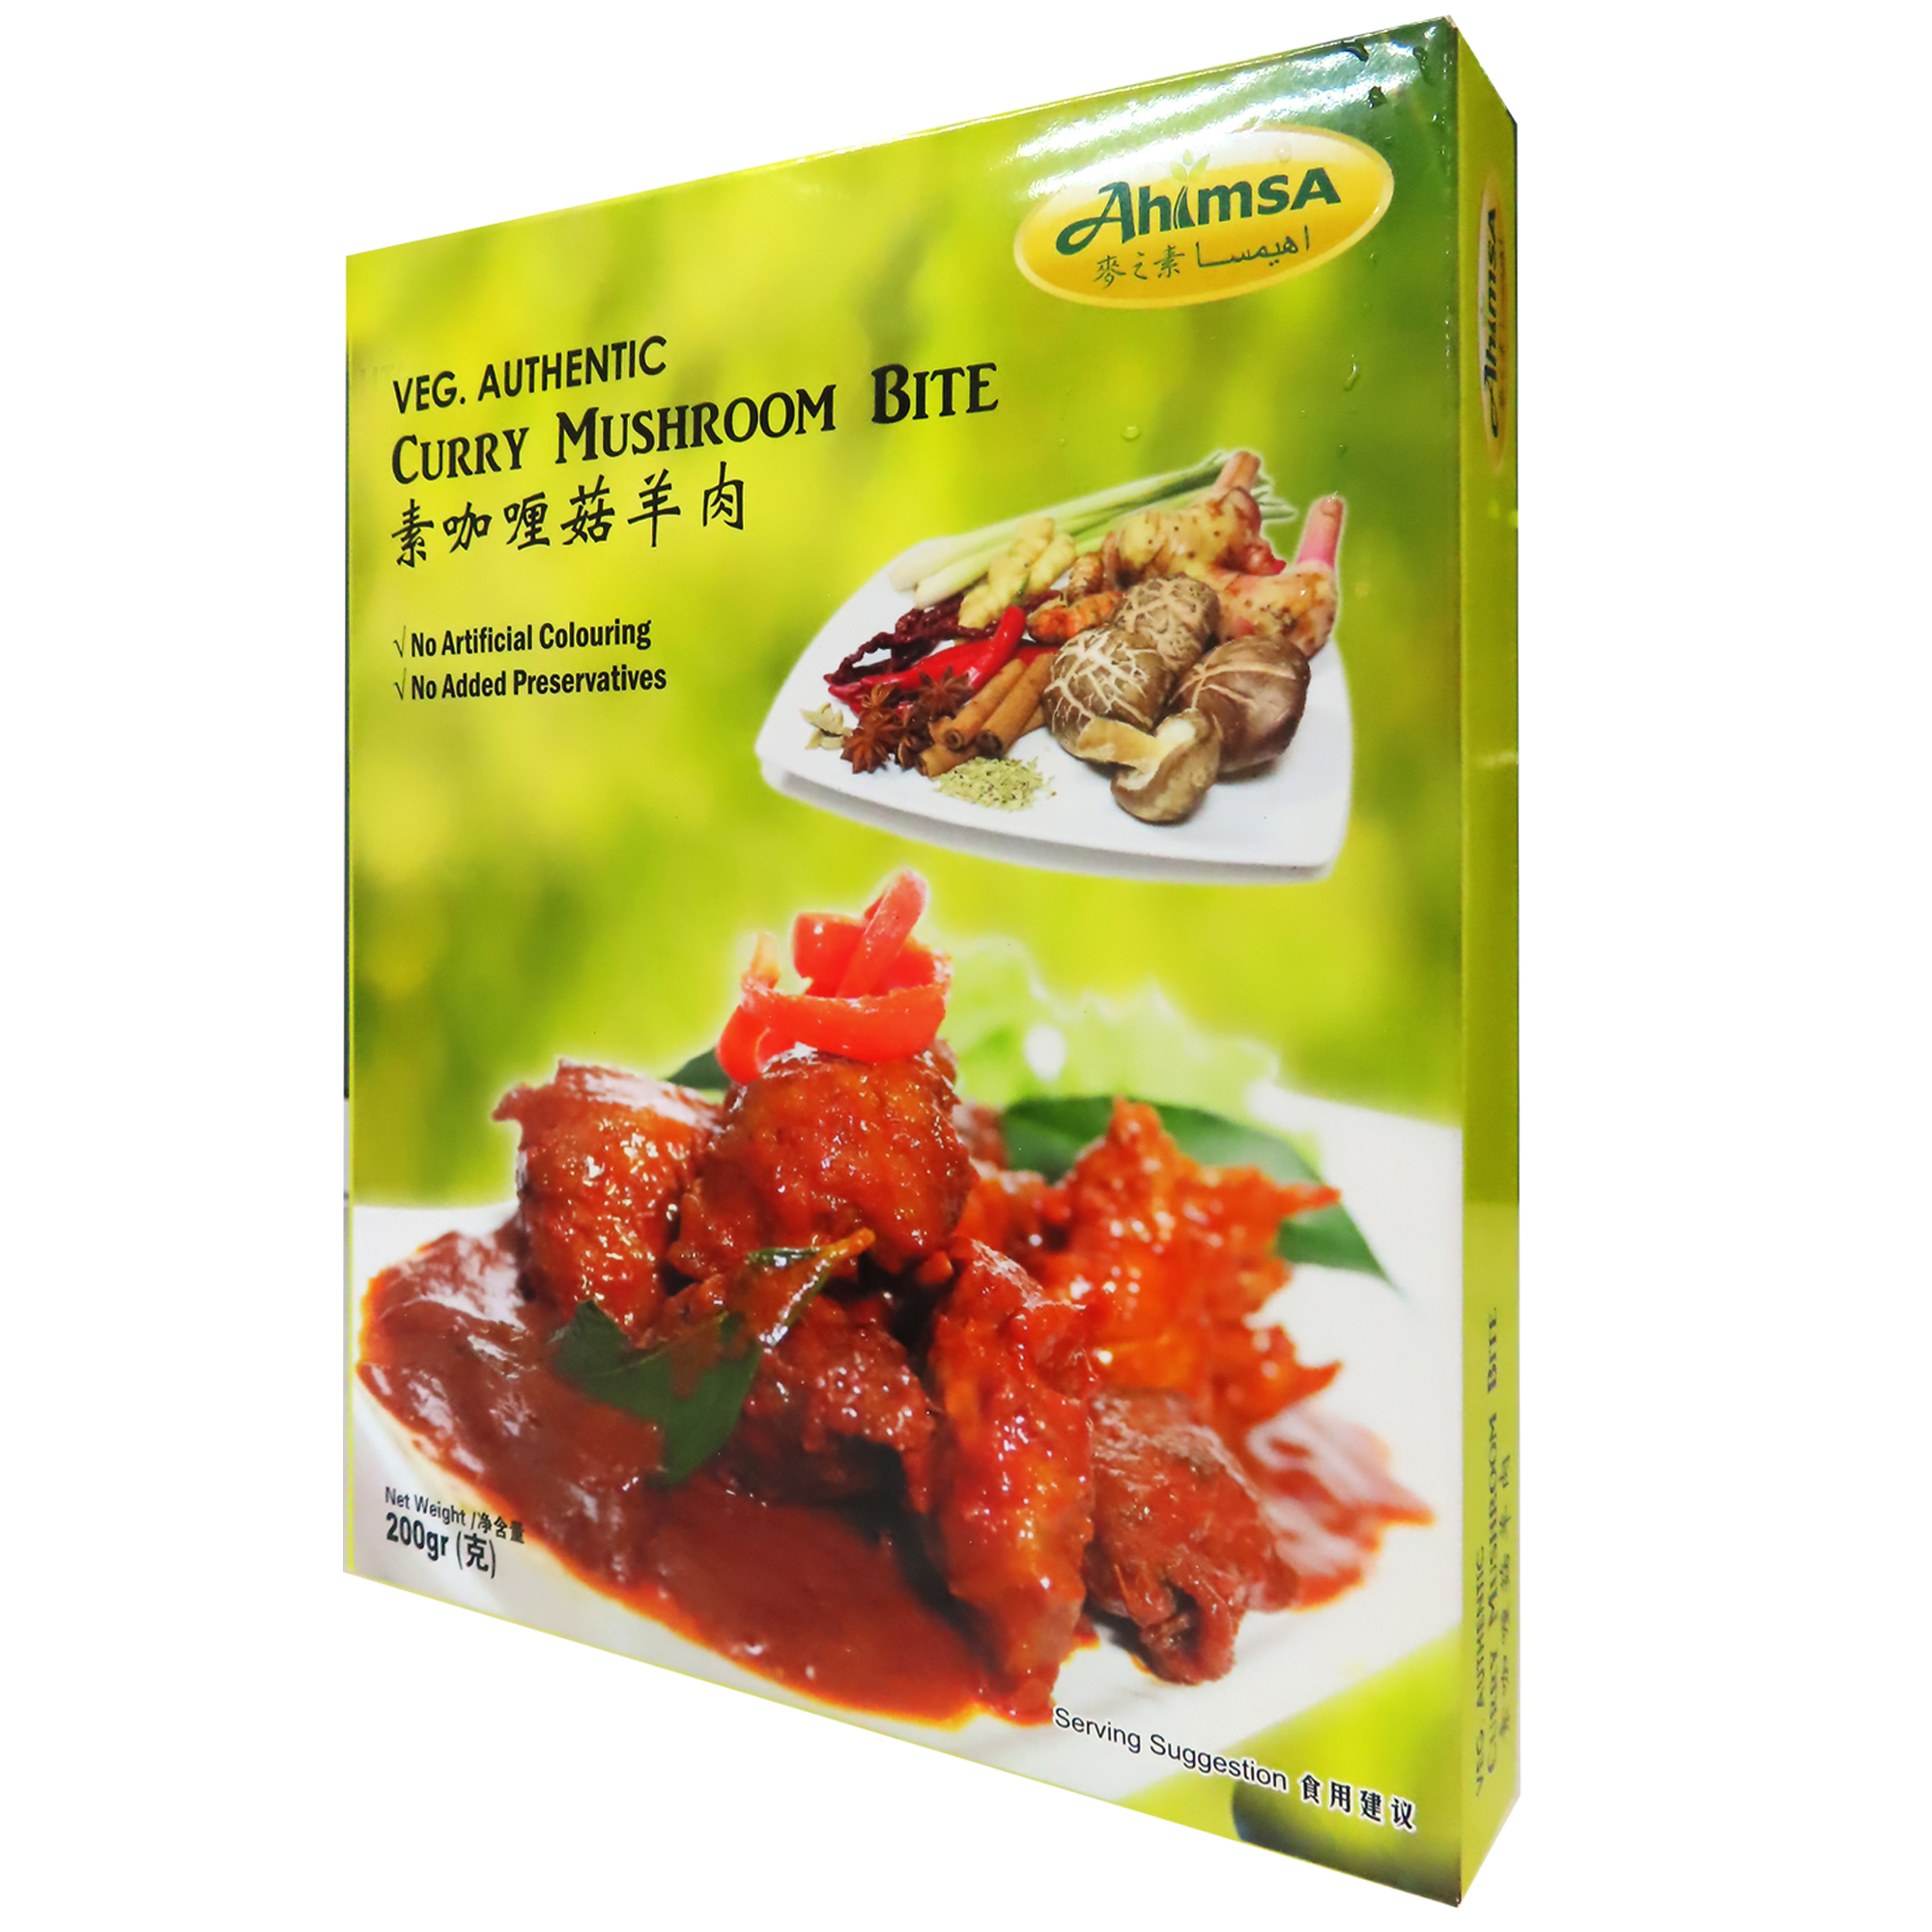 Image Ahimsa Veg Curry Mushroom Bite 麦之素 - 咖哩菇羊肉 200grams